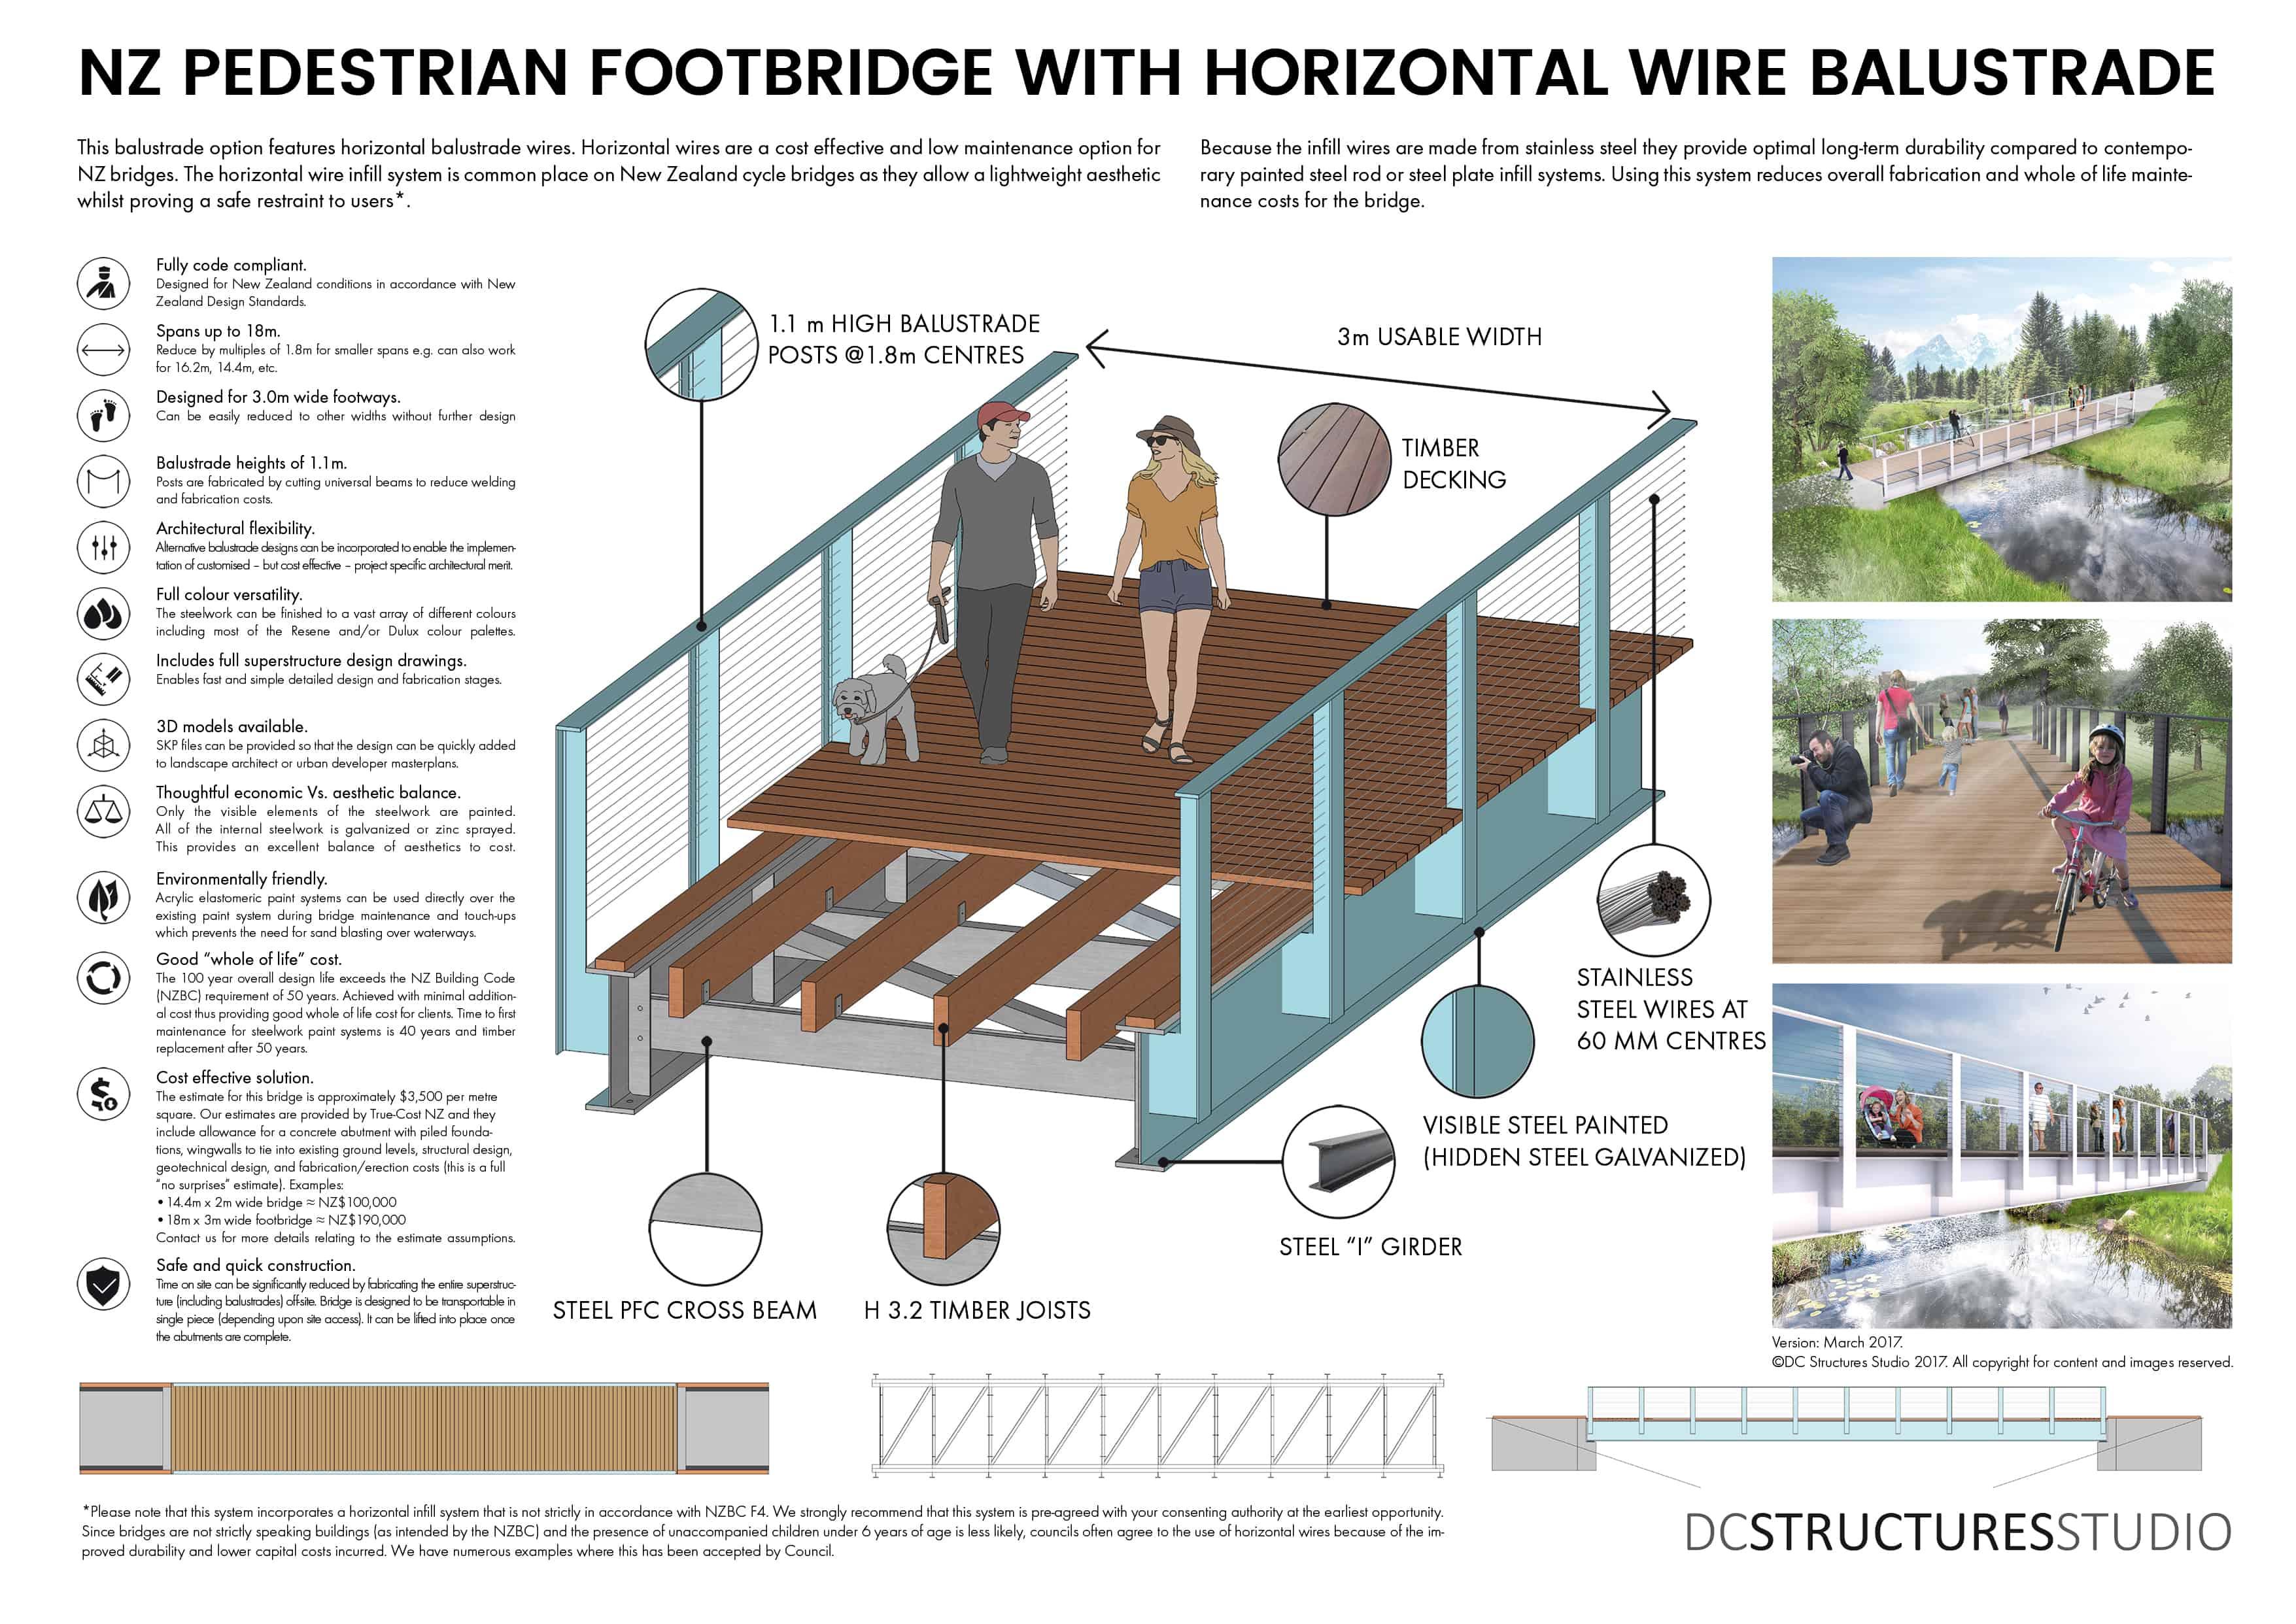 18m Standard NZ Footbridge with Steel wire - Drawing 02 Isometric Properties